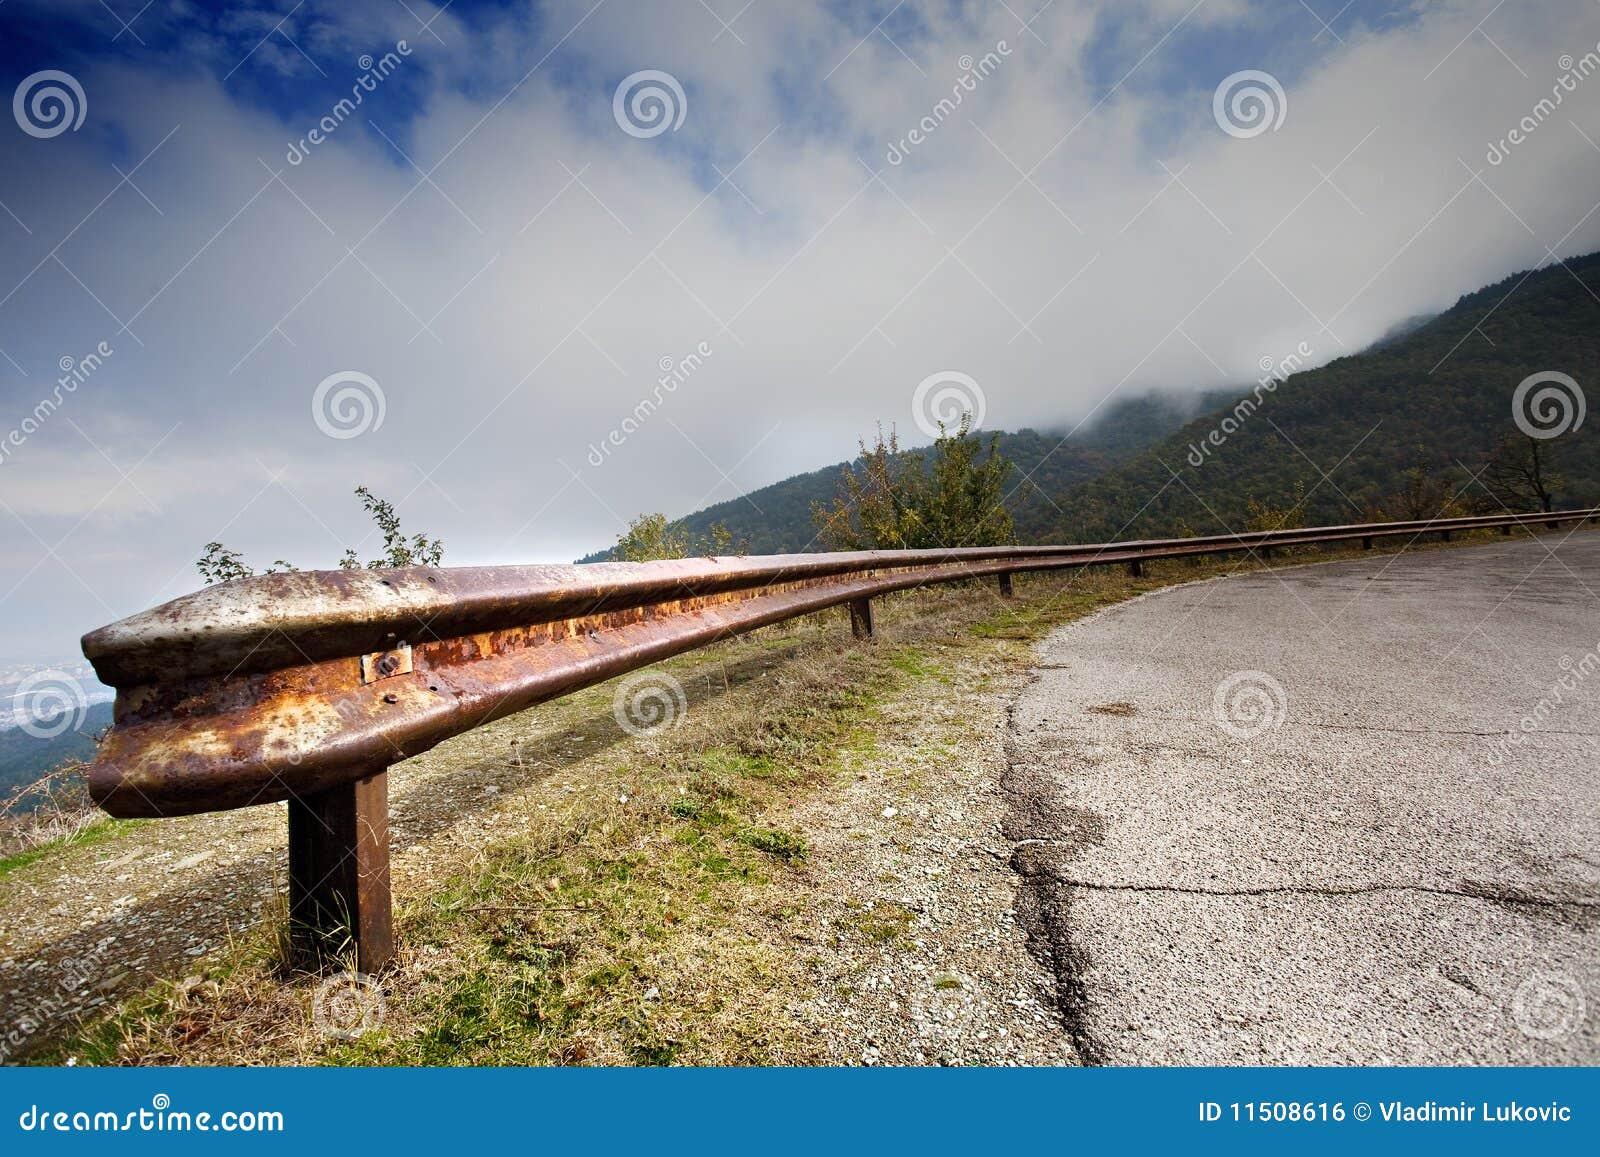 Highway guard rail royalty free stock image